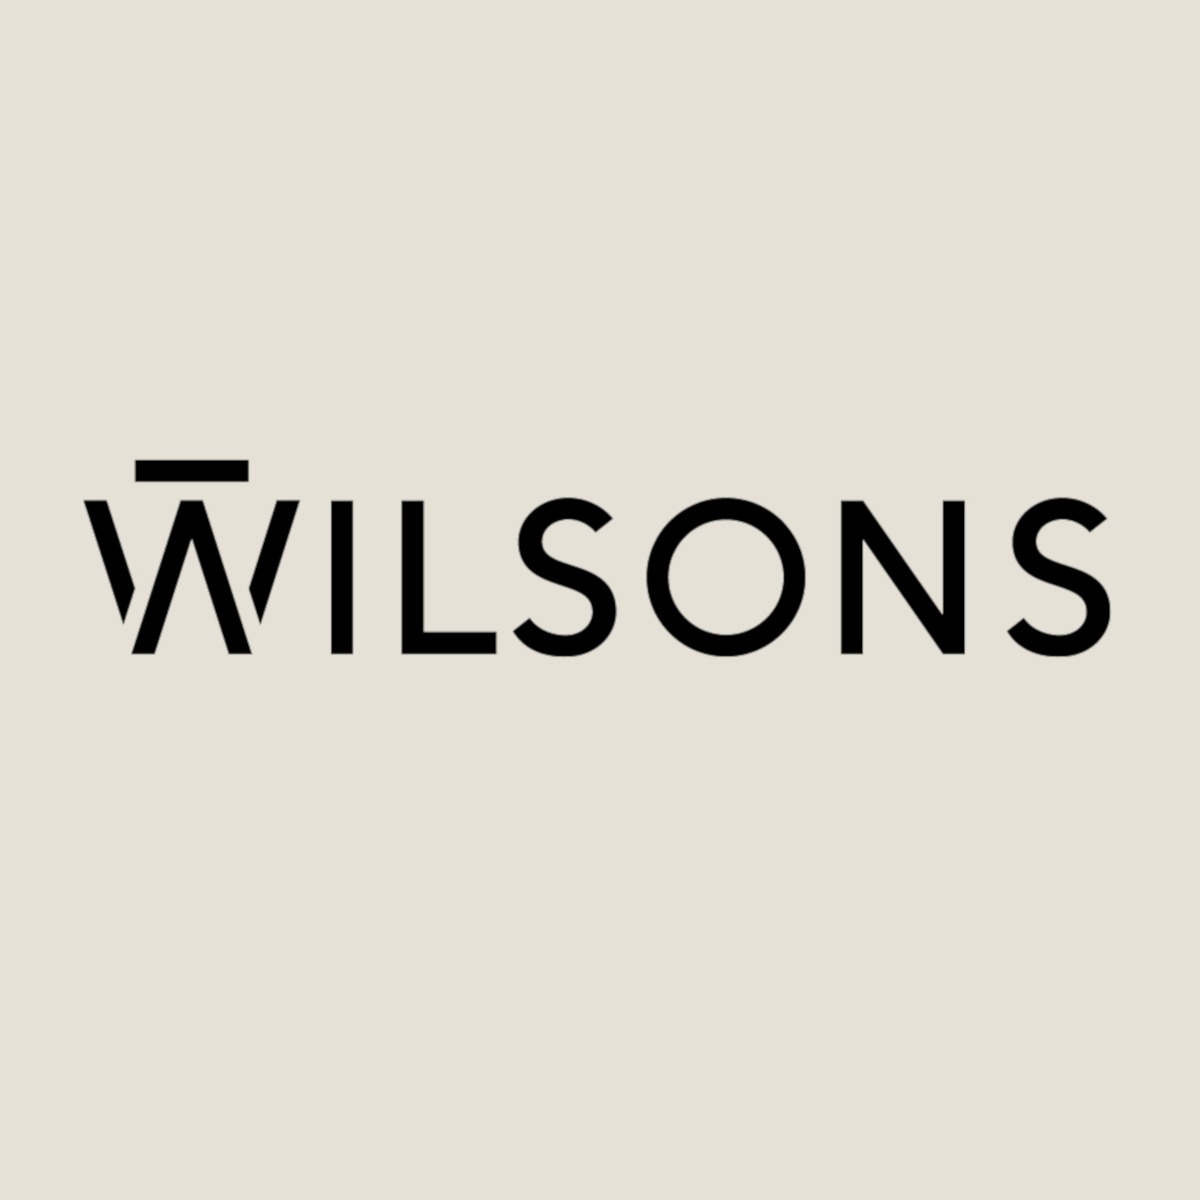 Wilsons logo 1200x1200